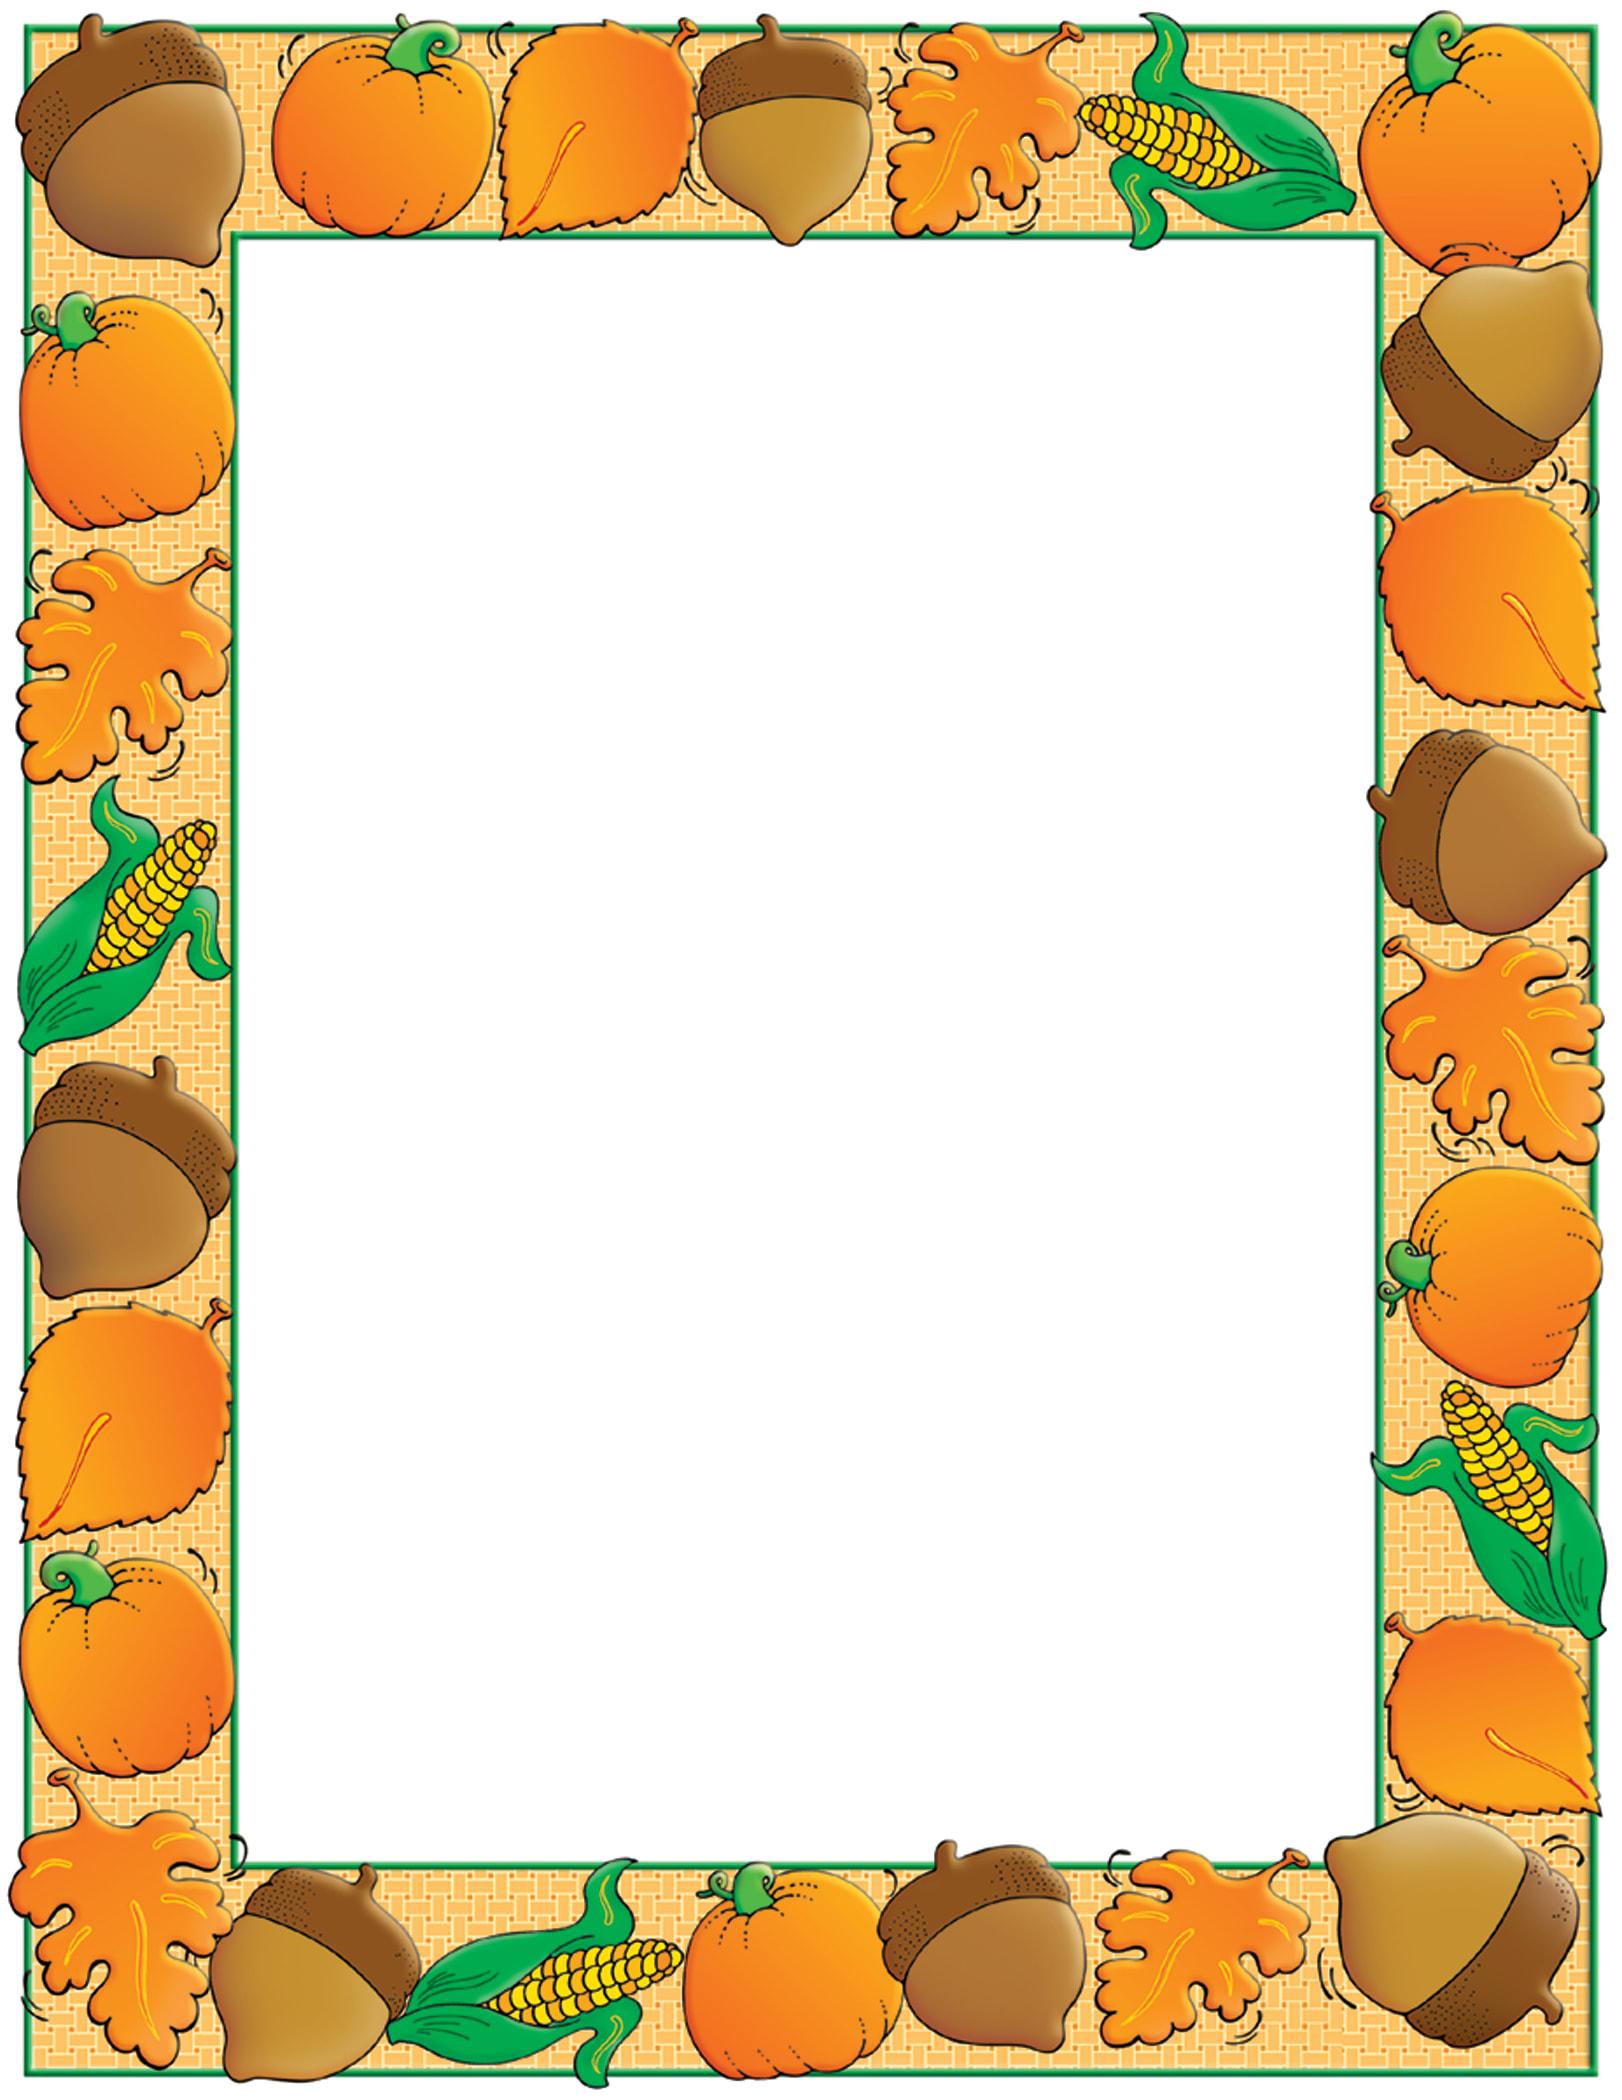 "Scholastic Colorful Design Paper, Autumn Harvest, 8 1/2"" x 11"", Pack Of 50"